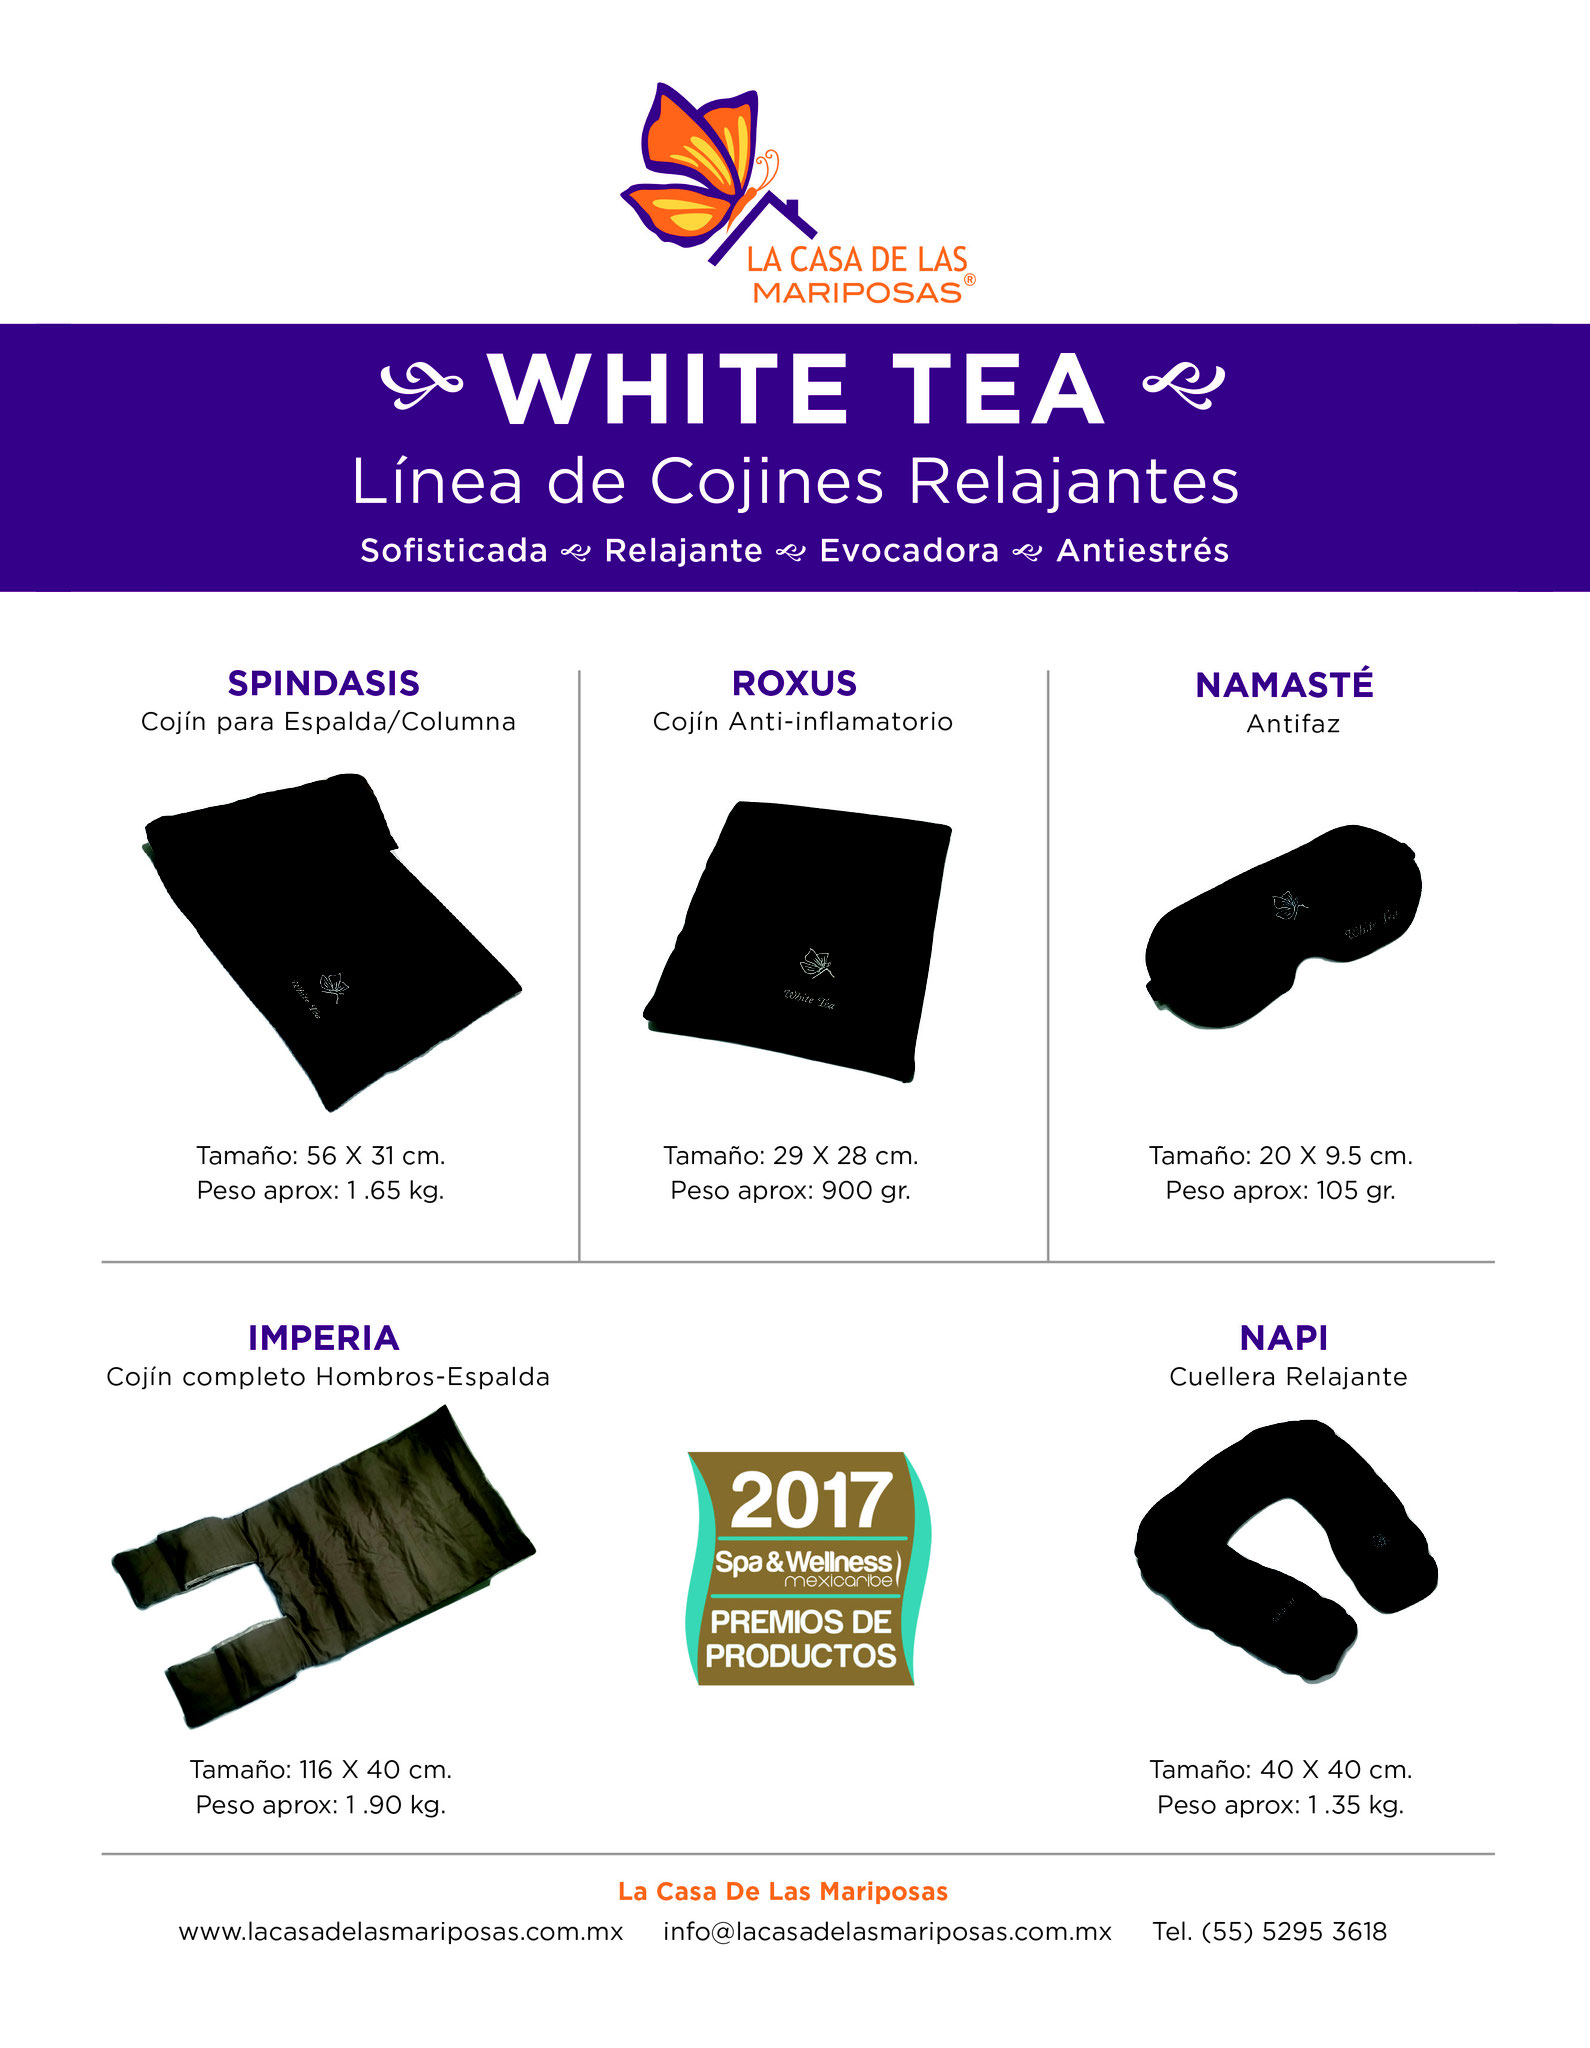 Premio Spa&Wellness MexCar 2017 a nuestra Línea White Tea